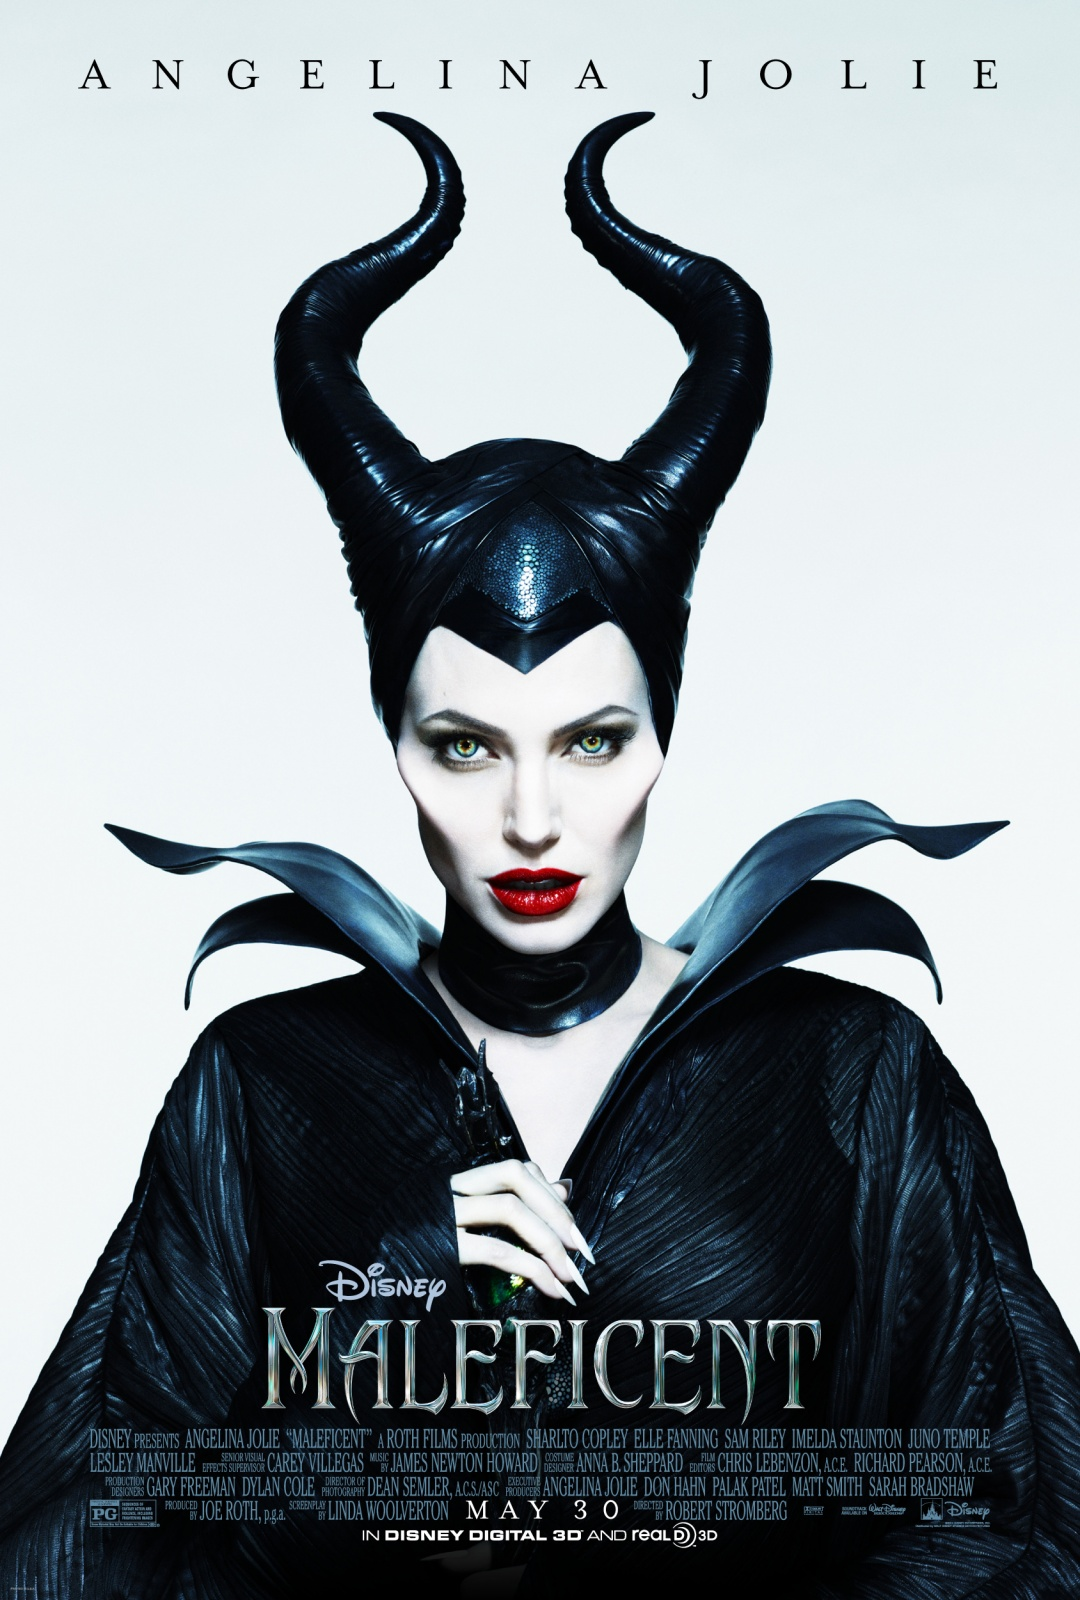 maleficent_poster_2014_02.jpg